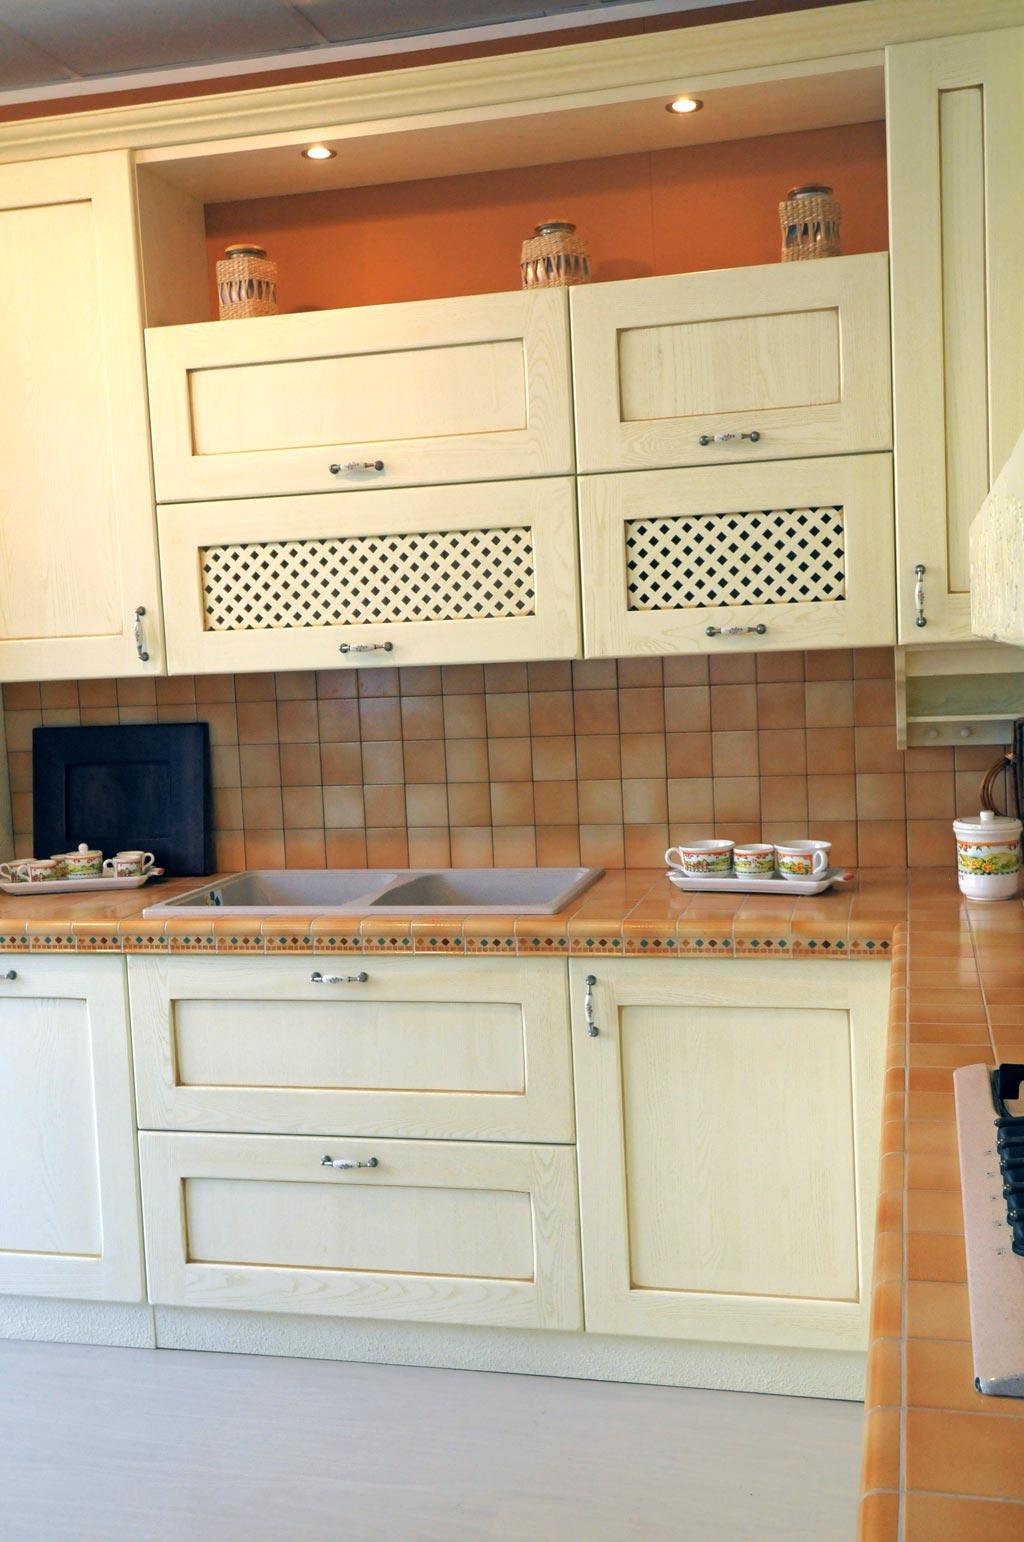 Come Arredare Una Cucina Classica. Affordable Cucina Classica ...